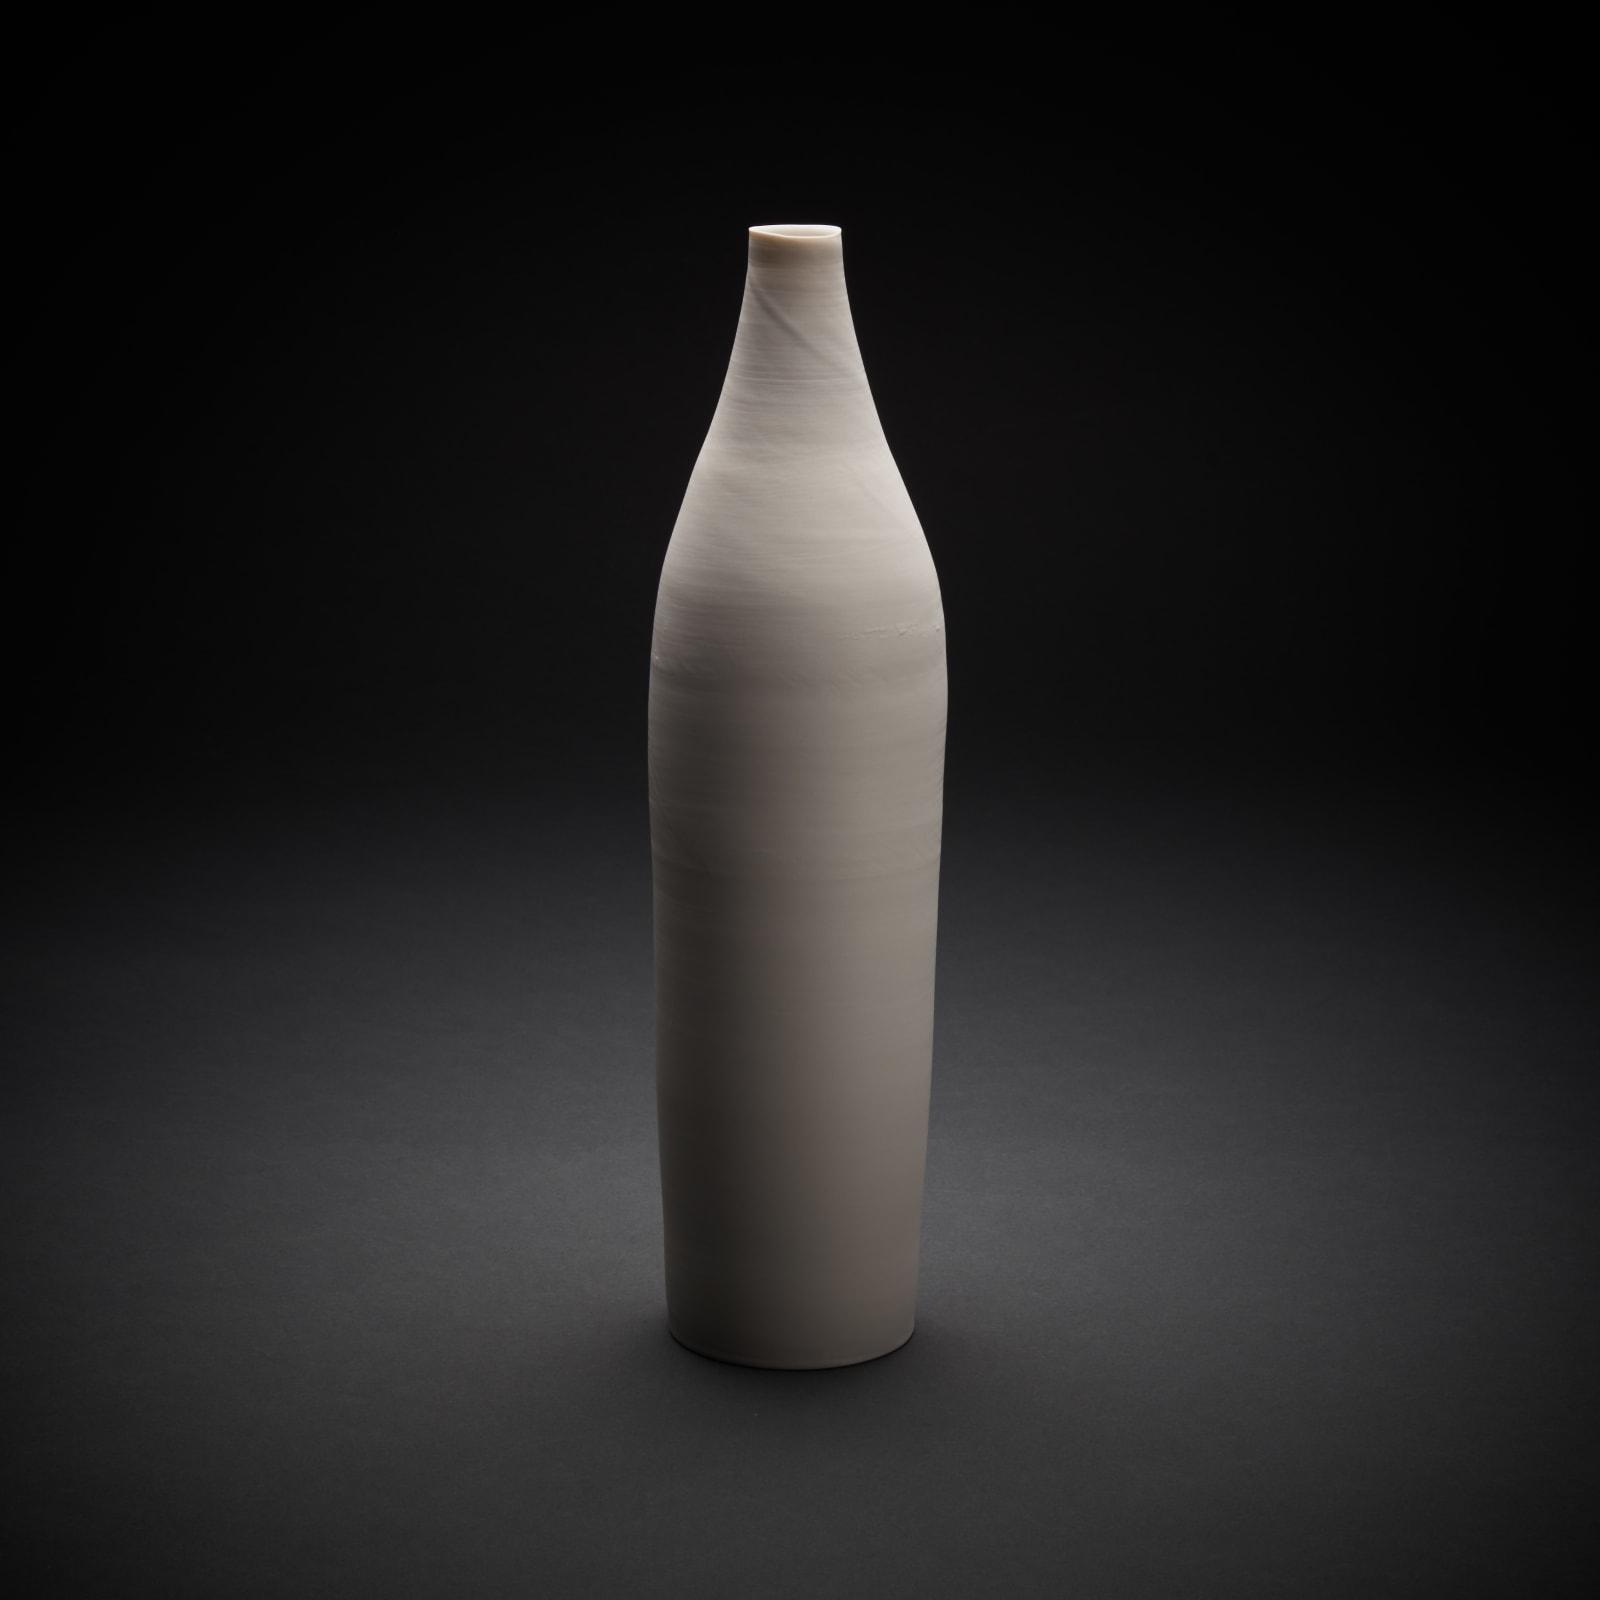 Taizo Kuroda, Untitled 75, 2018